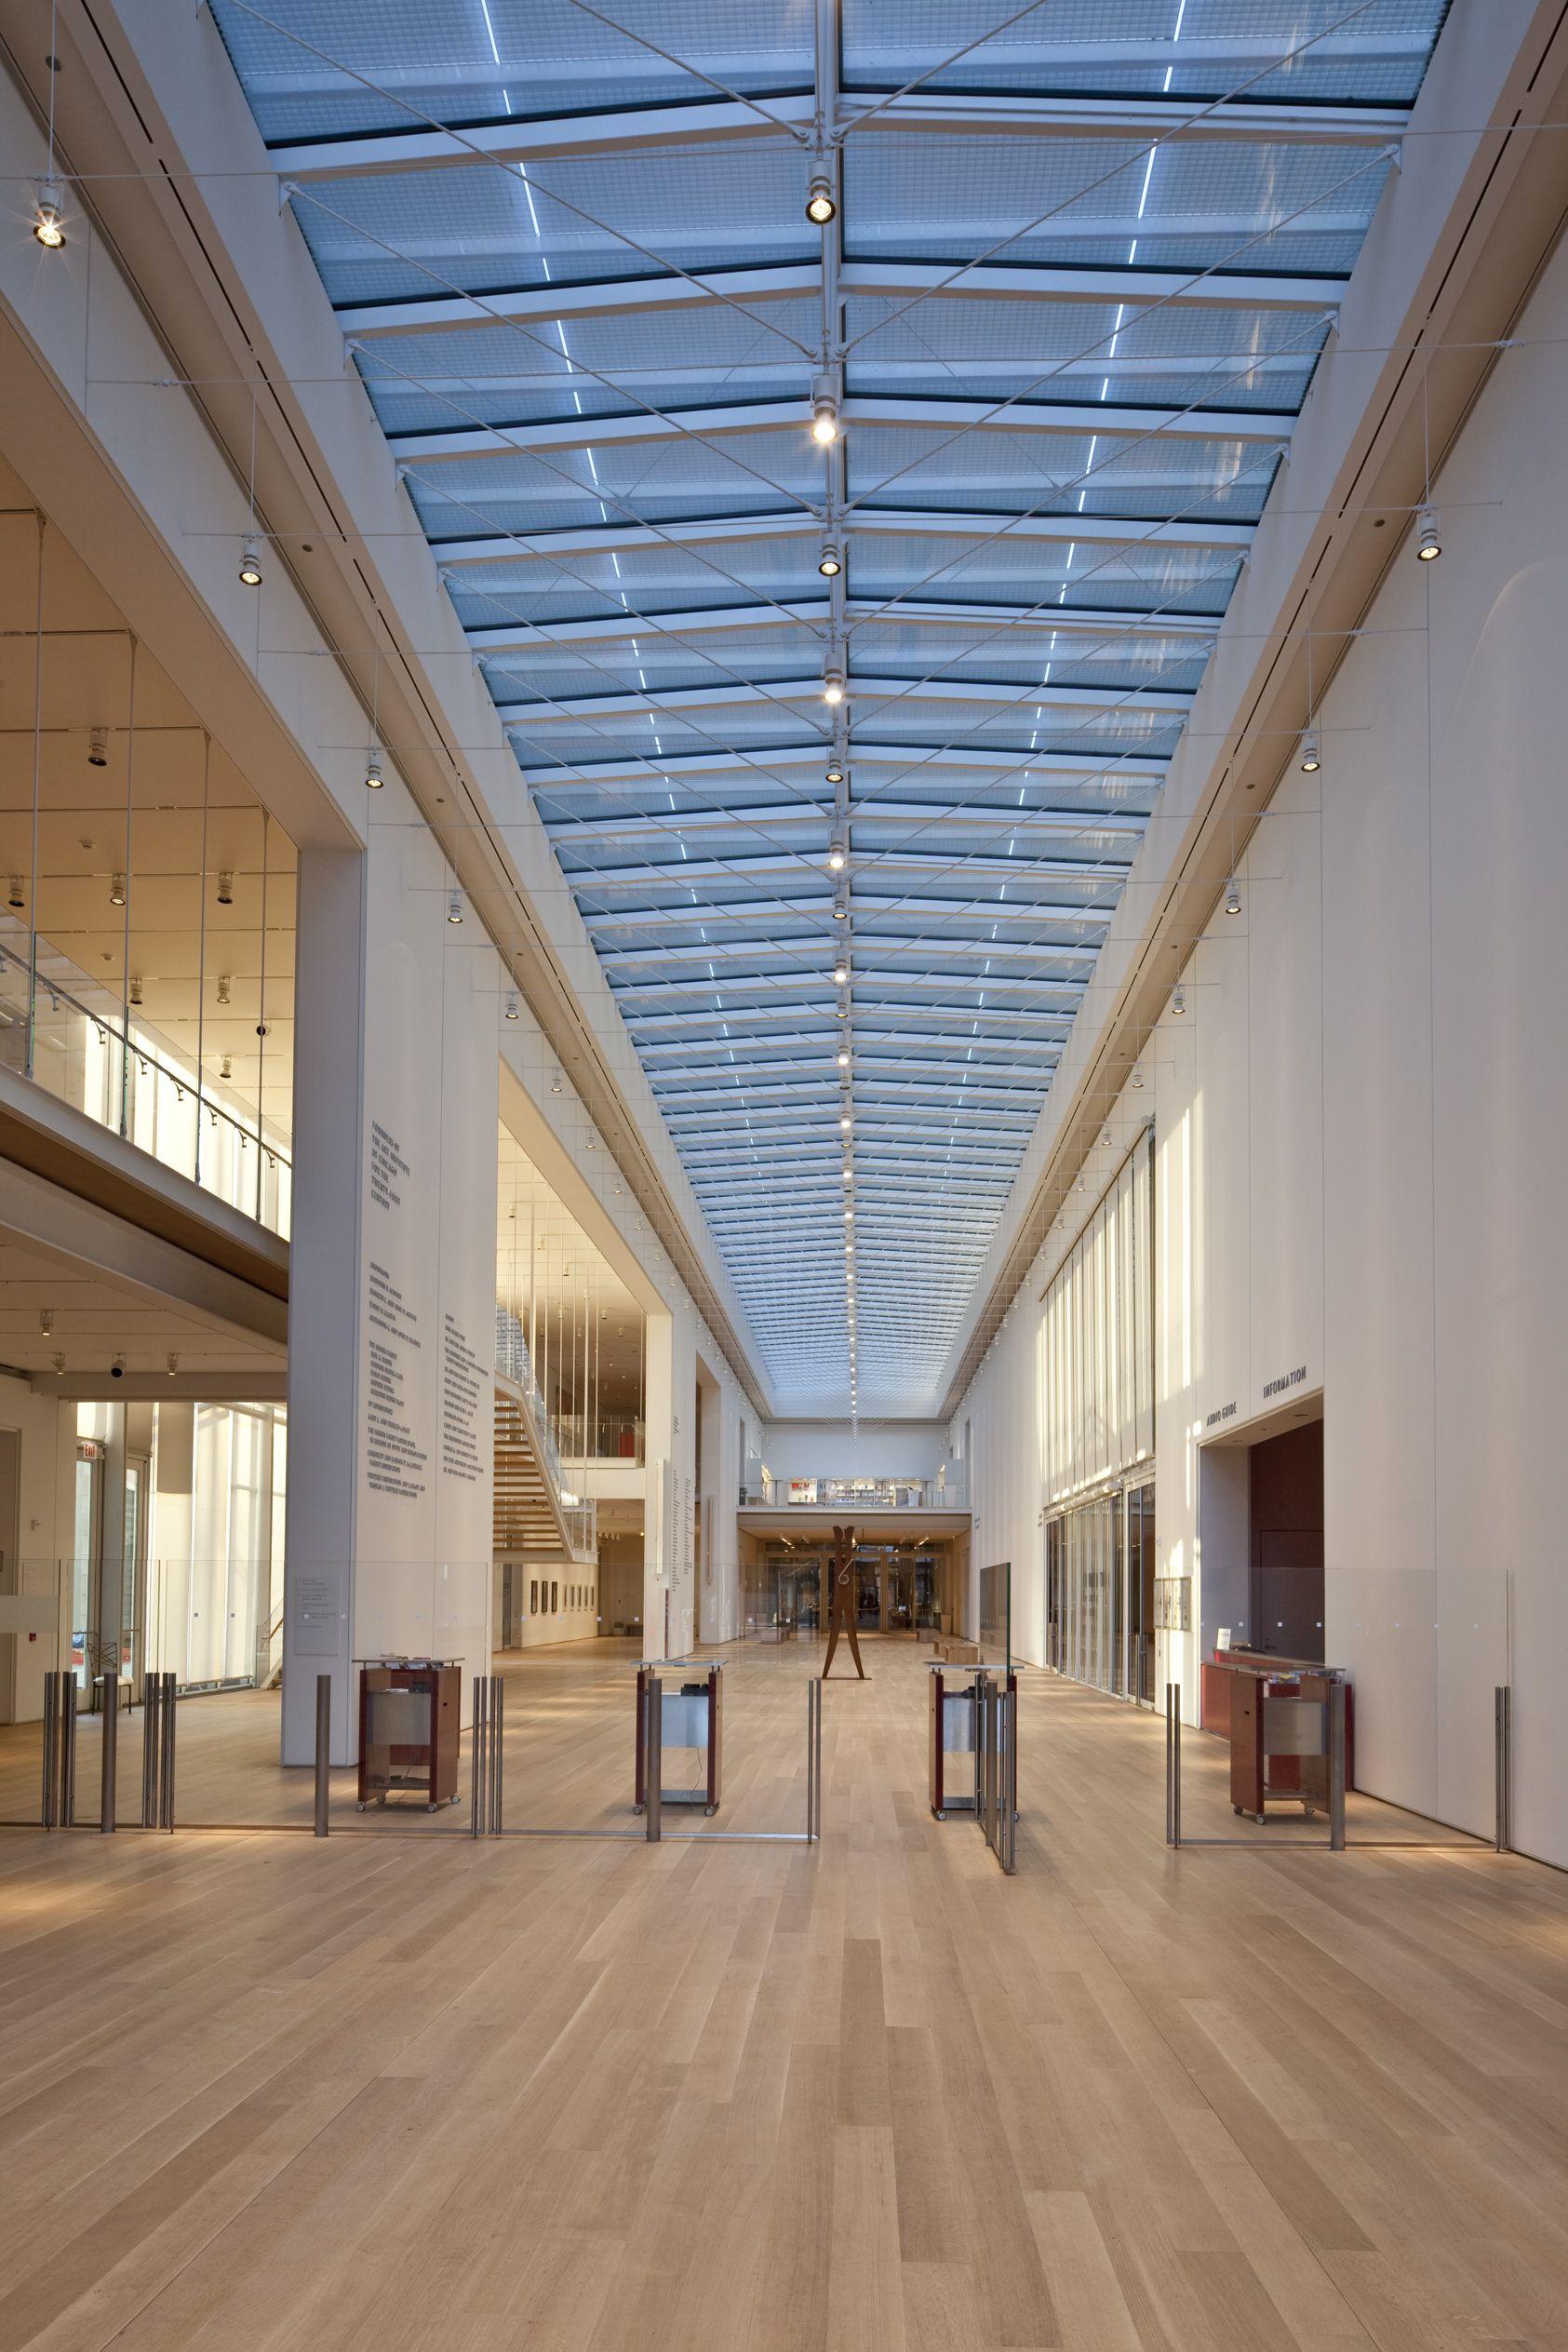 Chicago Art Institute Modern Wing Usa. Architectural